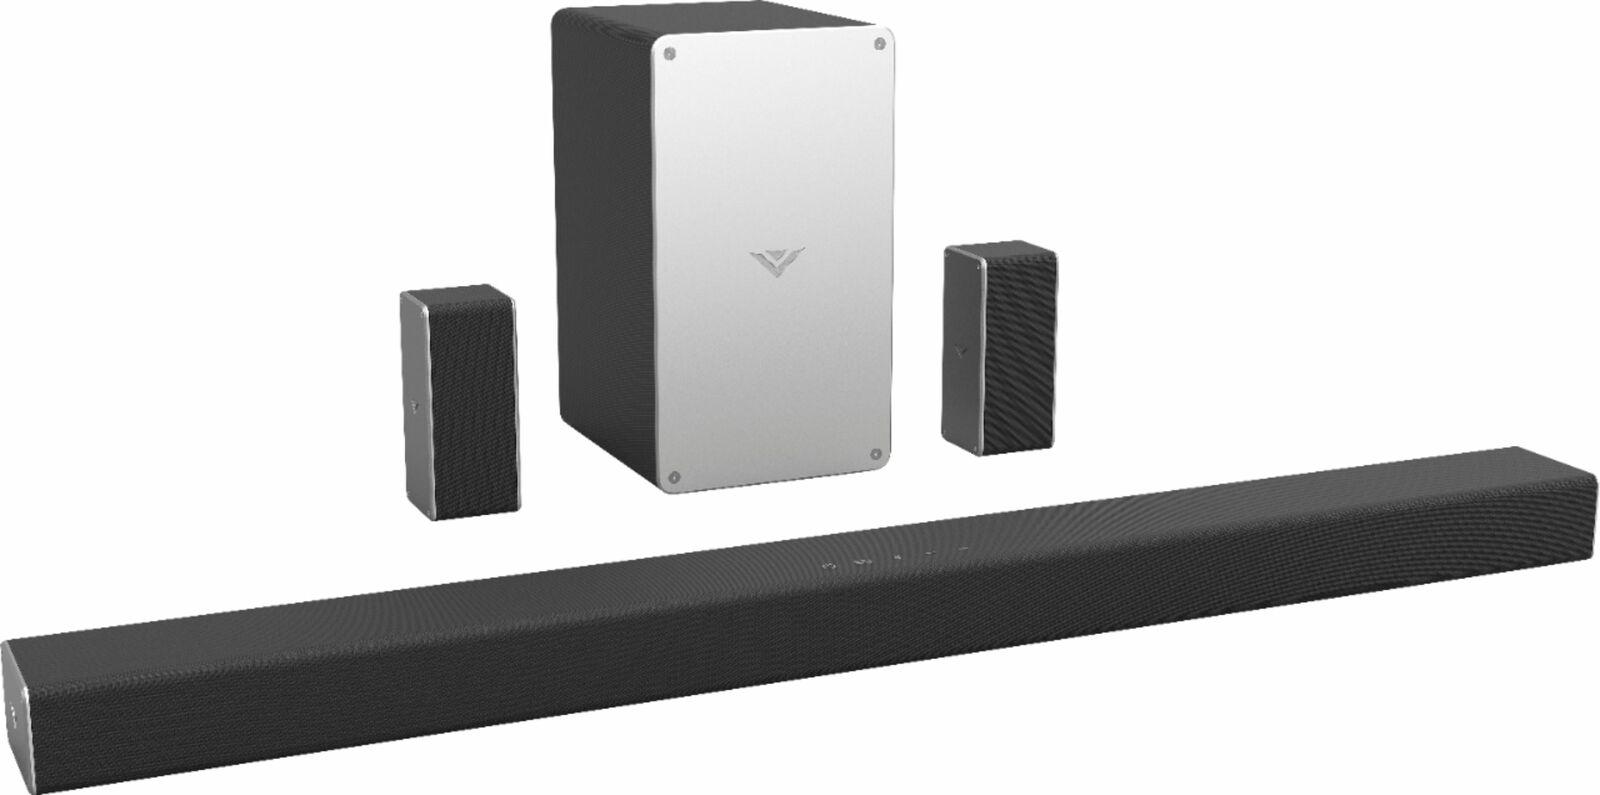 "VIZIO - SmartCast 5.1 Channel Sound Bar System with 5-1/4"" W"